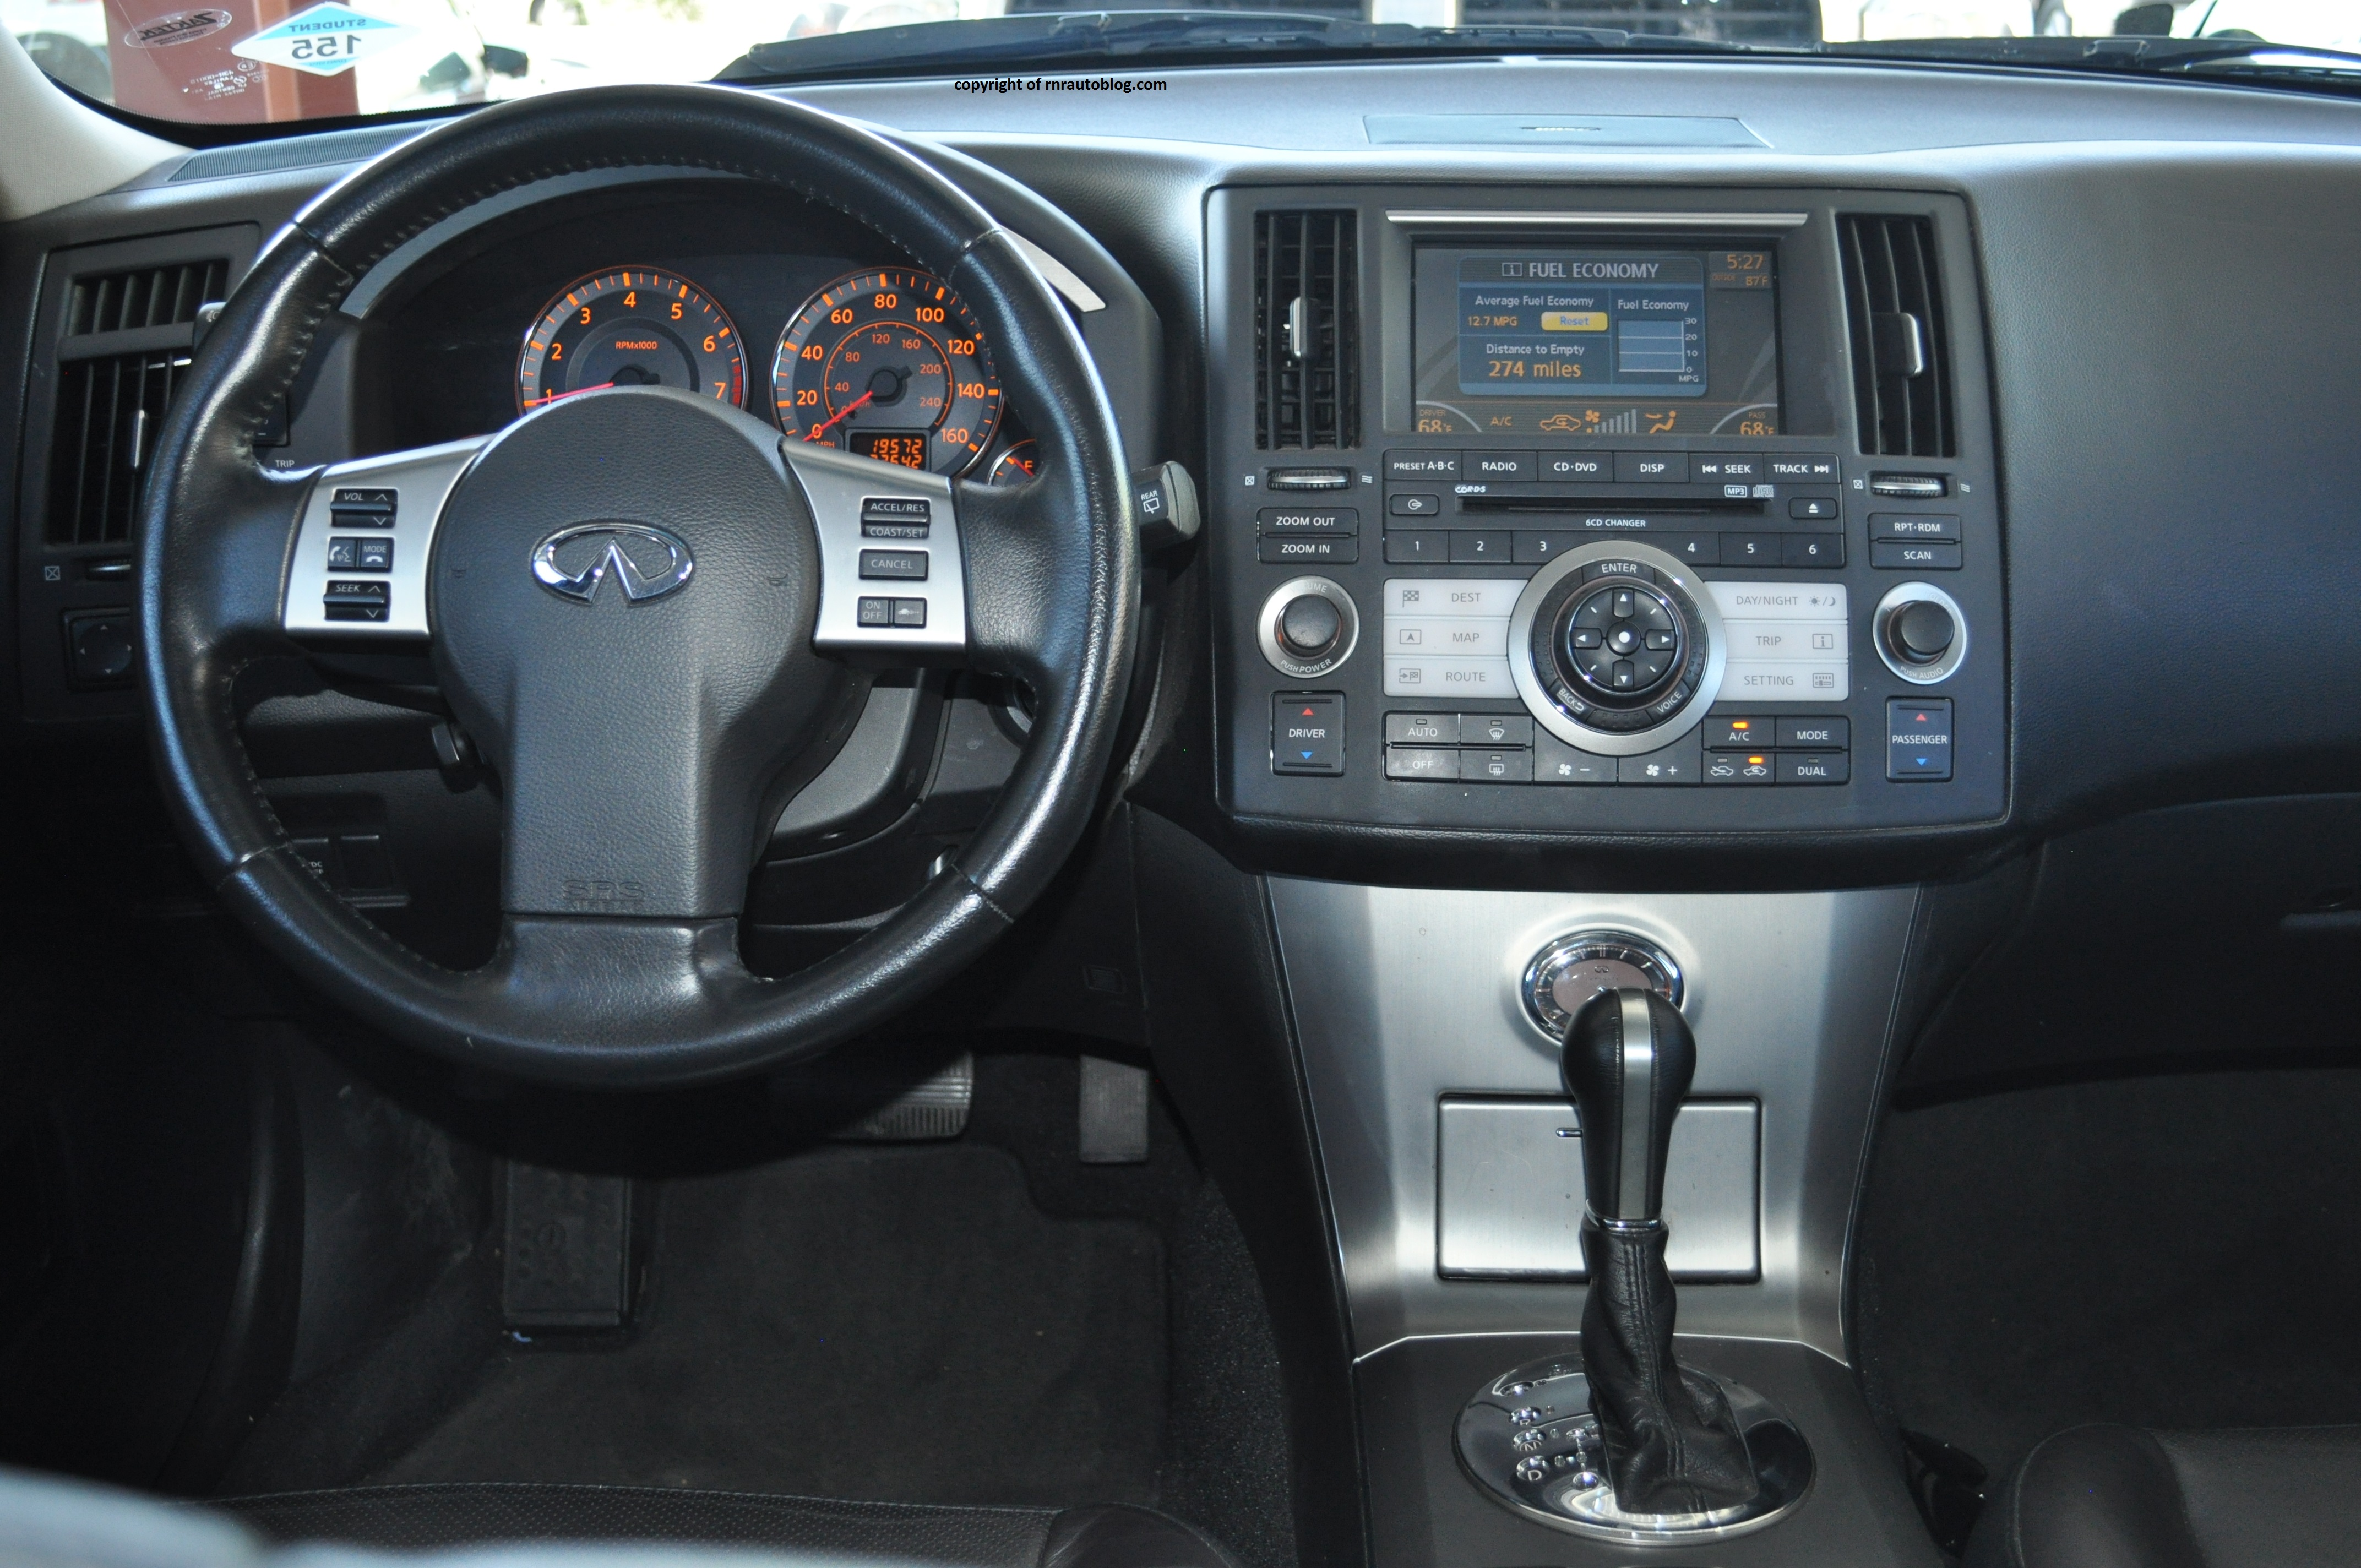 2008 infiniti fx35 review rnr automotive blog fx interior fx 6 vanachro Images